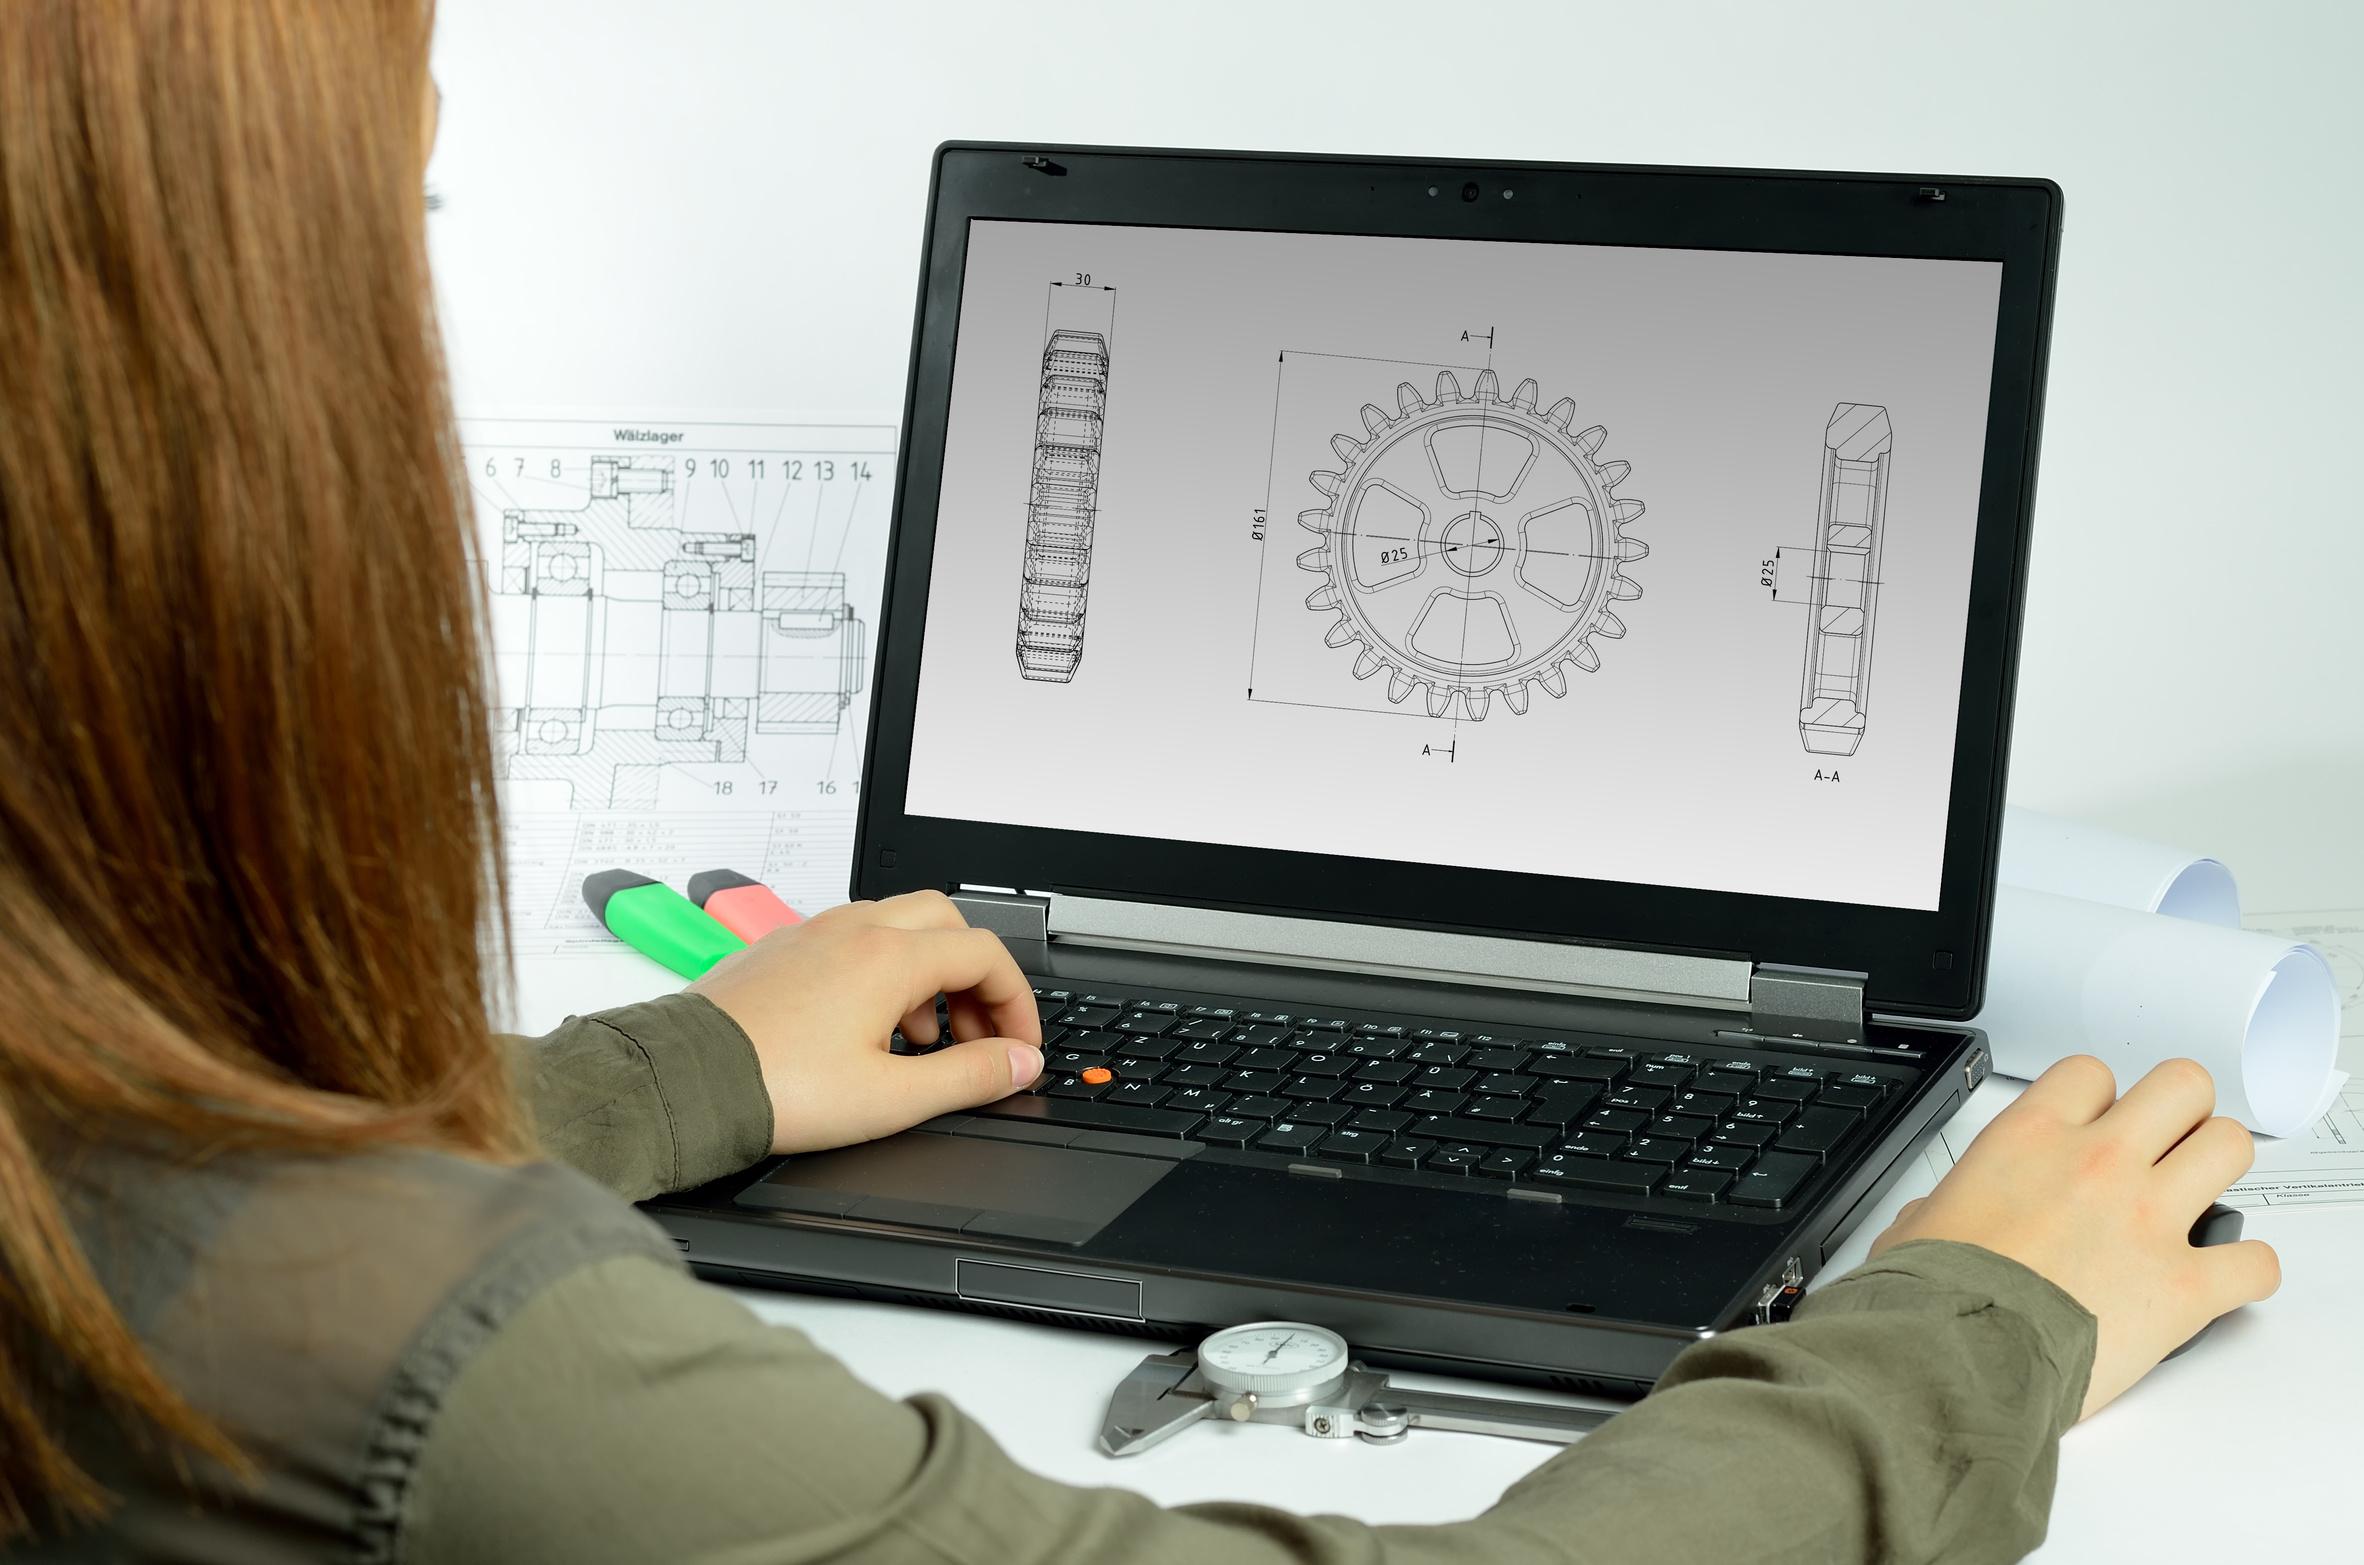 Technischer produktdesigner m w drexler automotive for Ausbildung produktdesigner